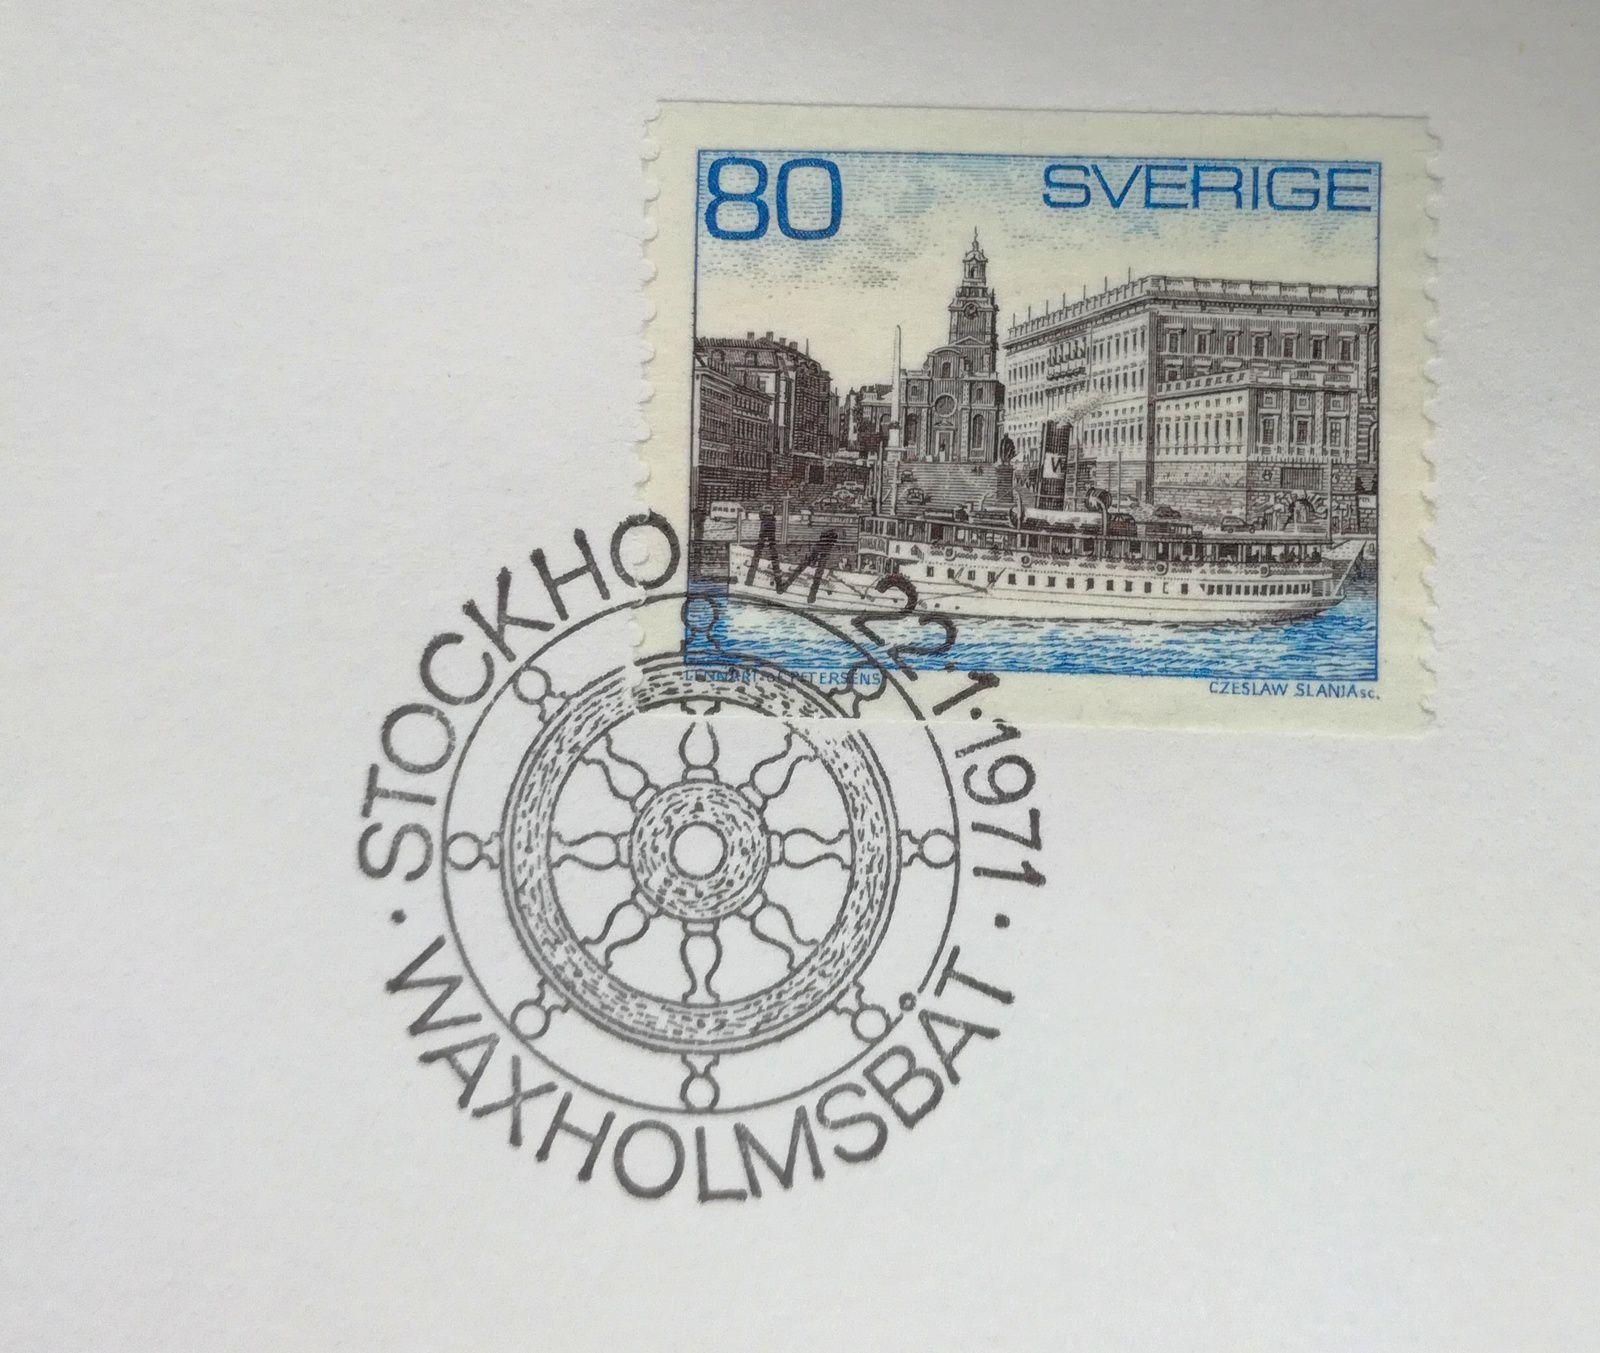 FDC : Waxholms Ångfartygs AB